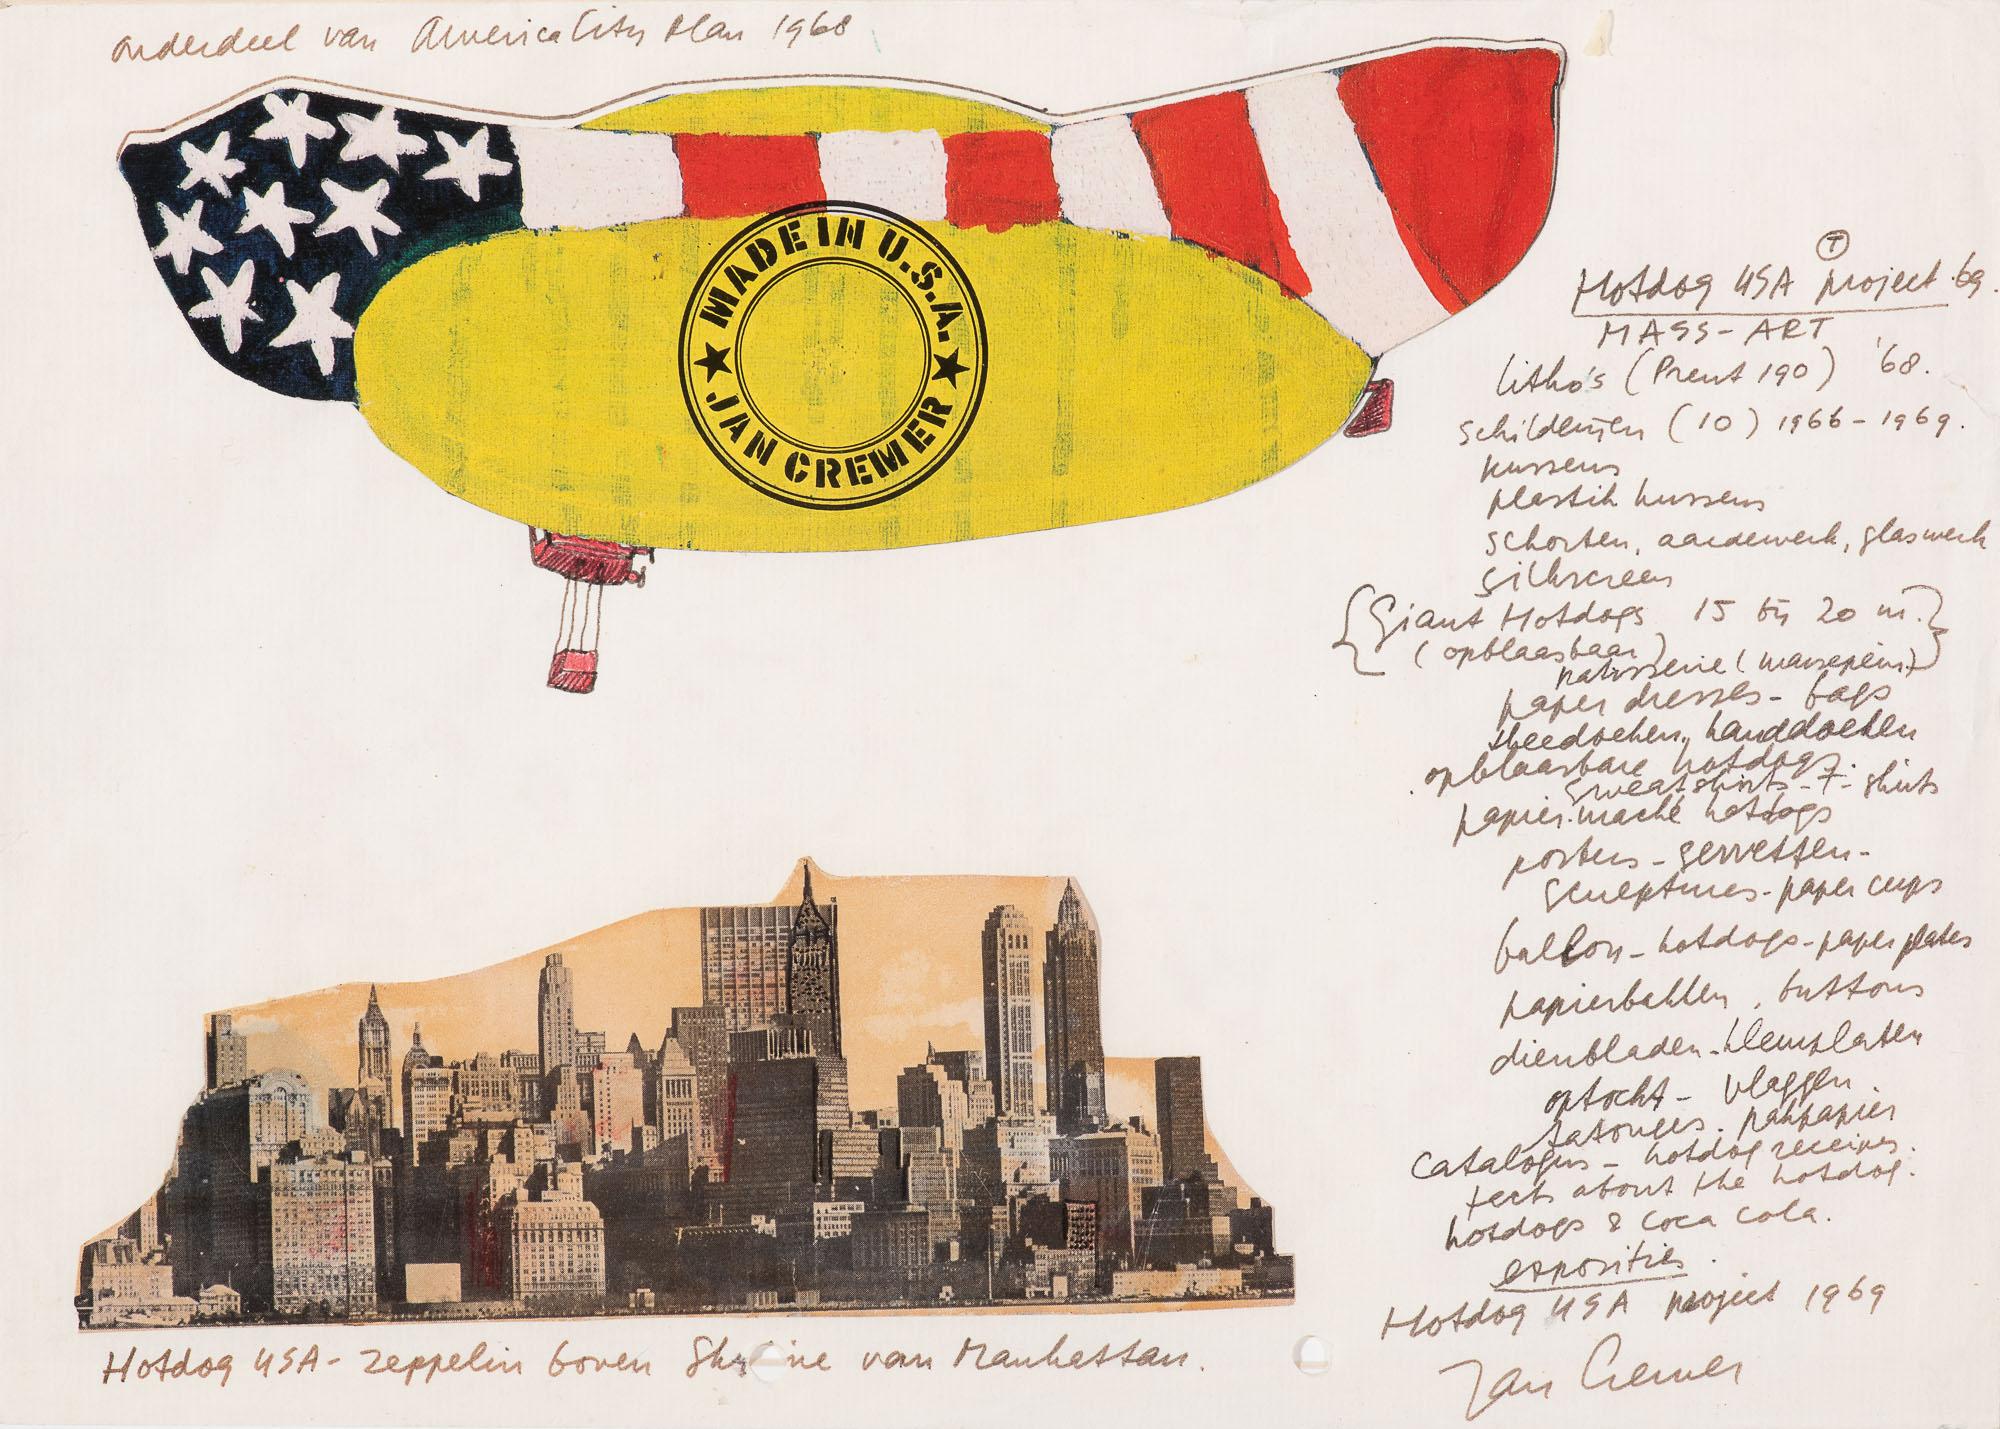 American City Plan 1968: Hotdog USA - Zeppelin, 1969